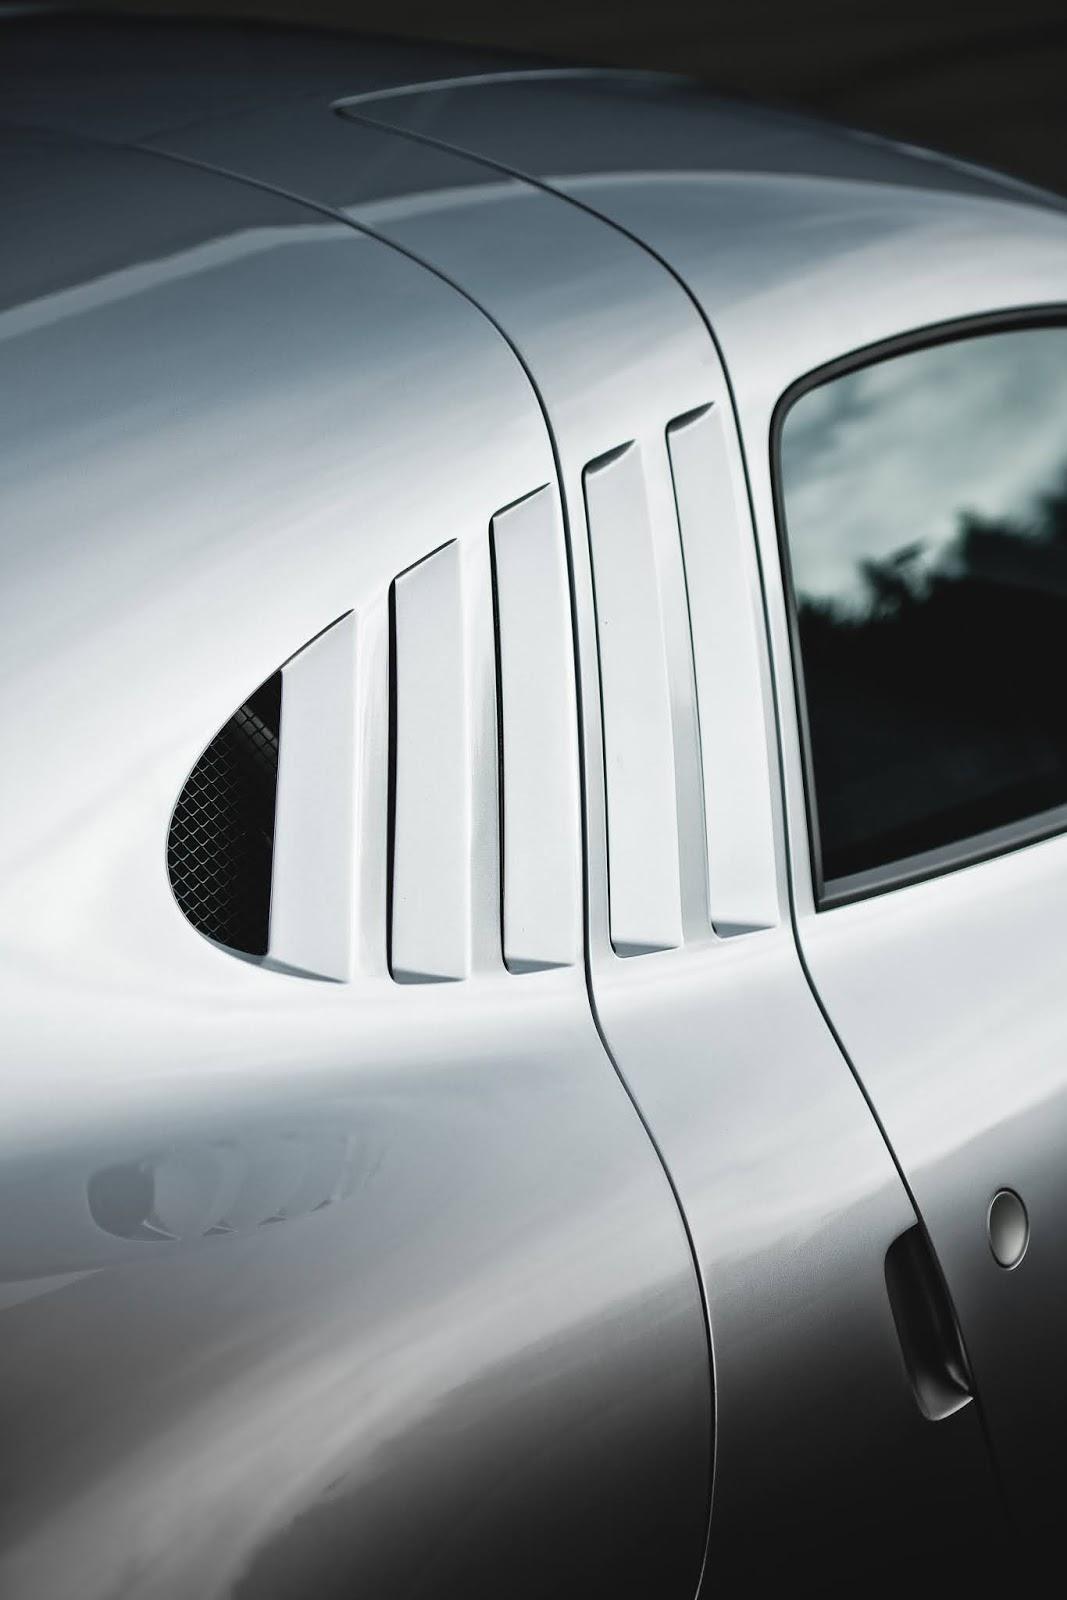 CVS0742 Le Mans Living Legend : Το πρωτότυπο που γέννησε την 718 Cayman GT4 LE MANS, Porsche, Porsche Le Mans, Porsche Unseen, sportscar, supercar, supercars, zblog, ειδήσεις